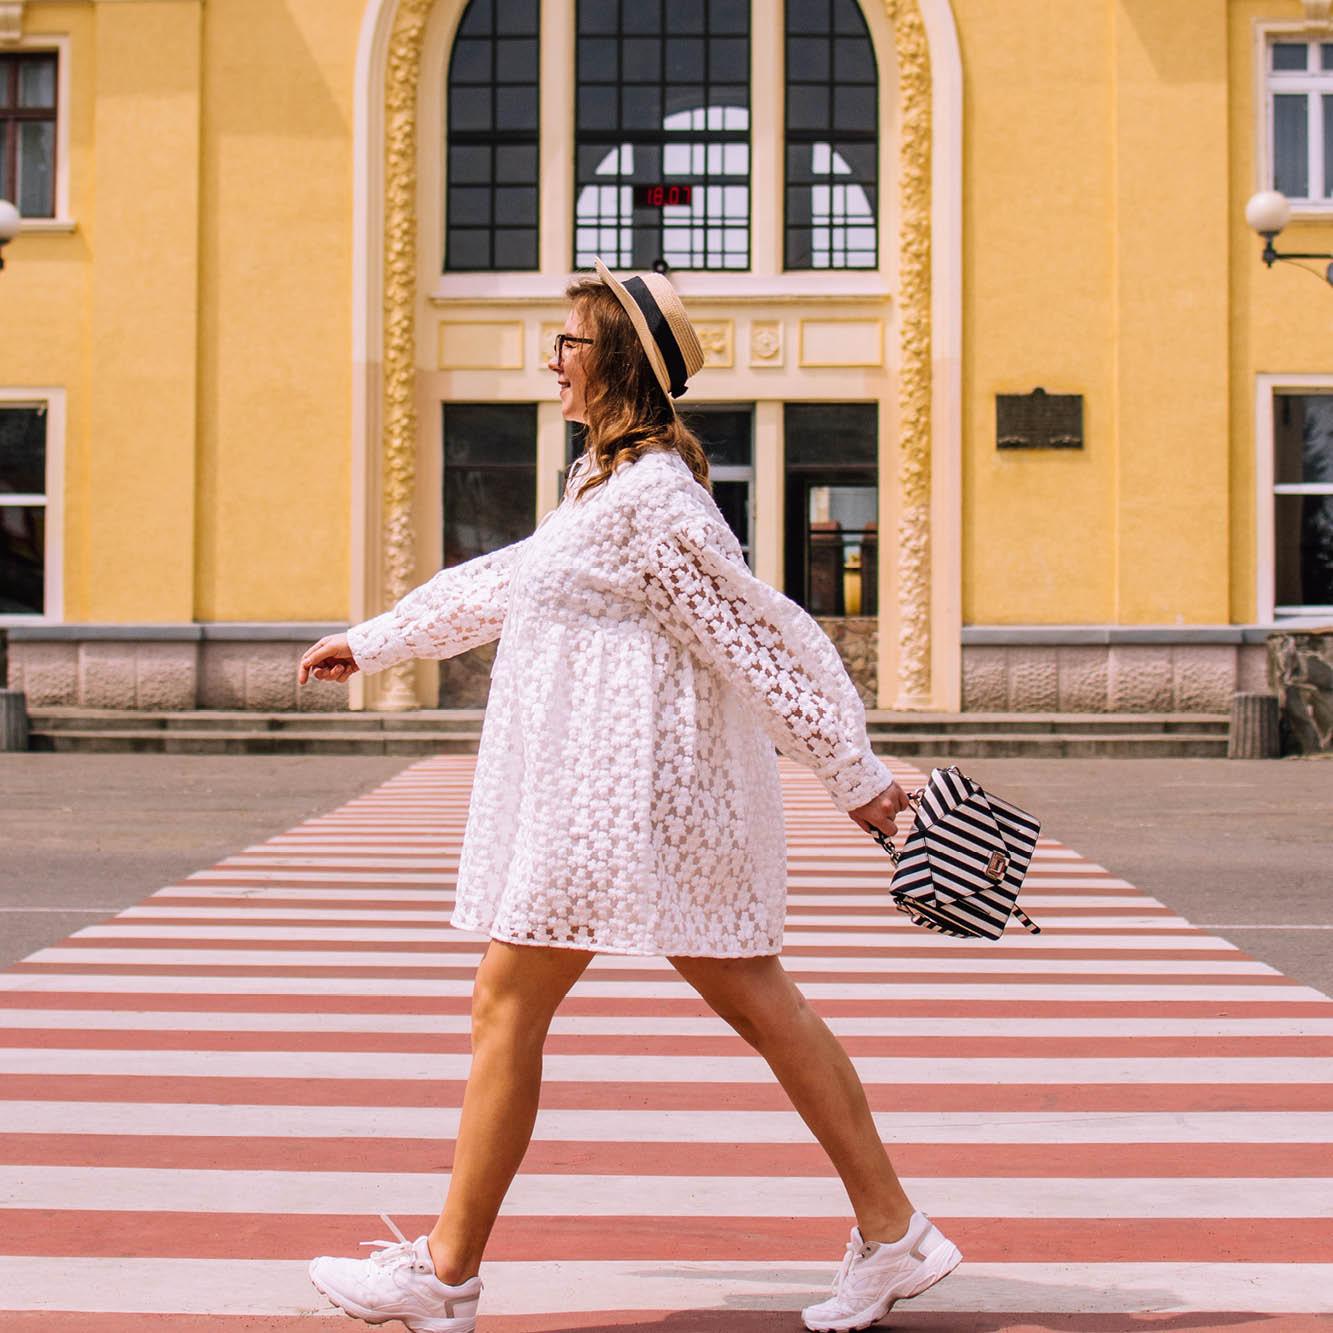 3 x influencer outfits | Shop de look van je favoriete influencers!